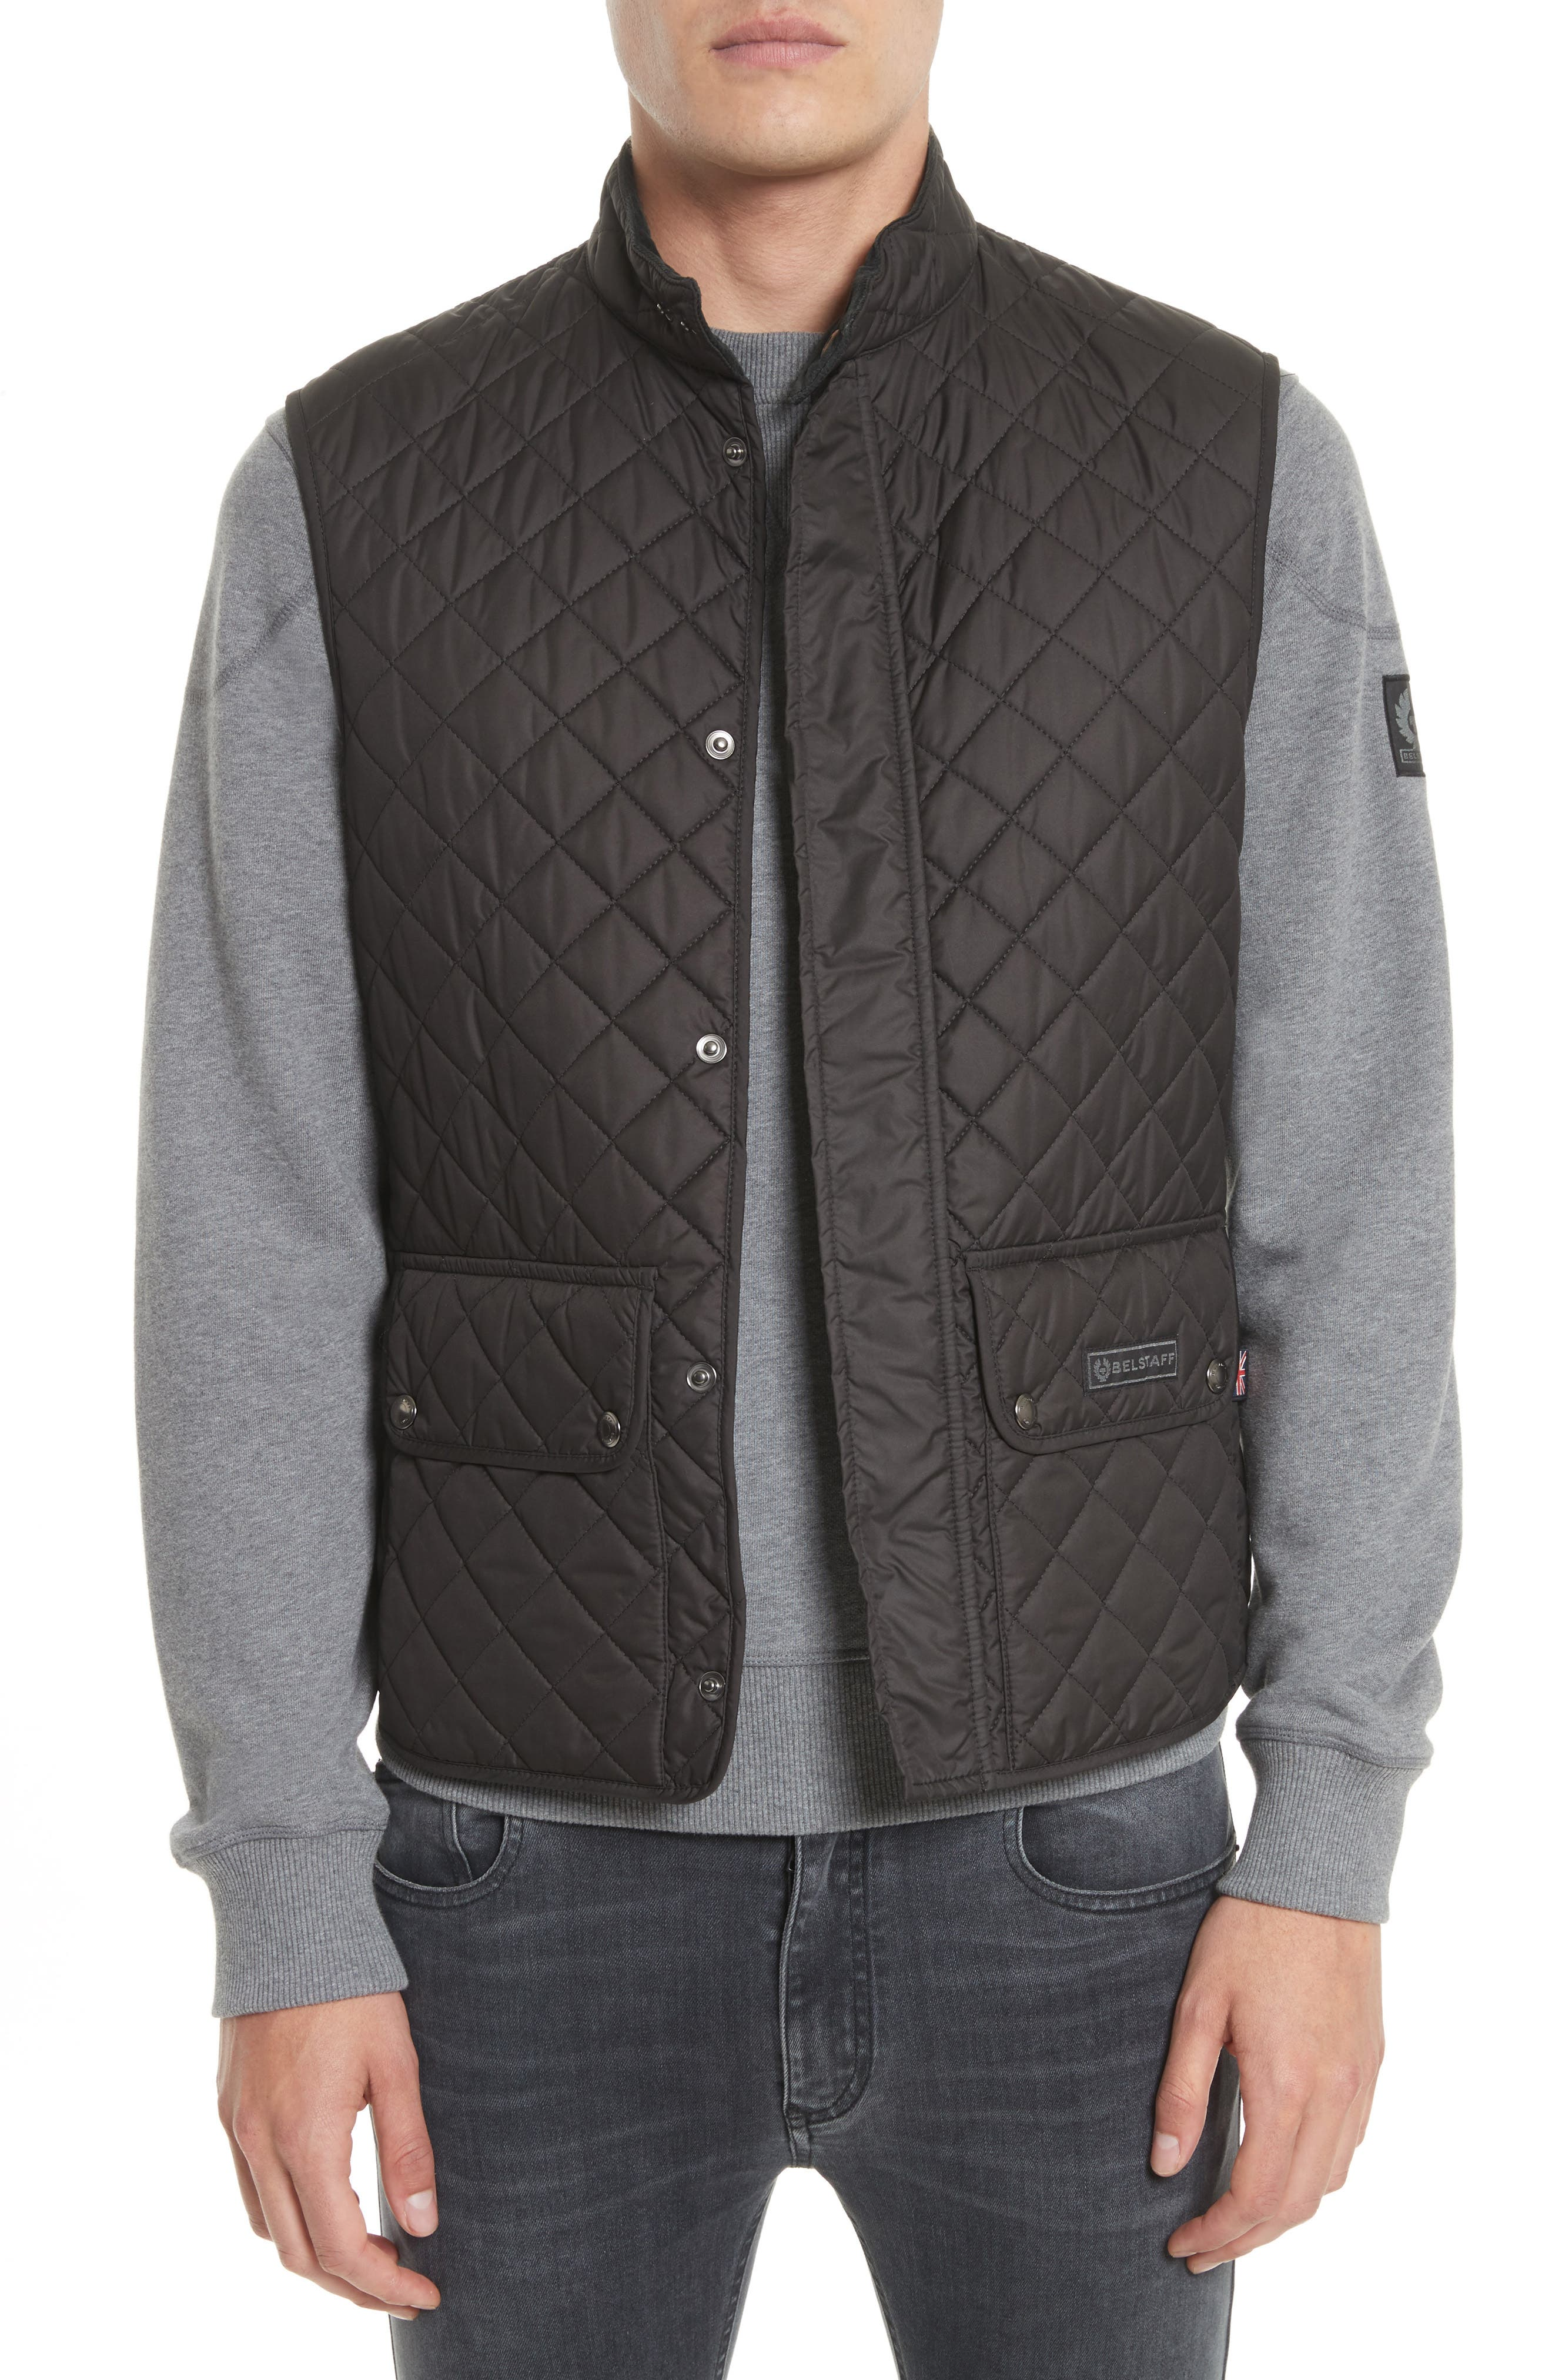 Alternate Image 1 Selected - Belstaff Waistcoat Tech Quilted Vest